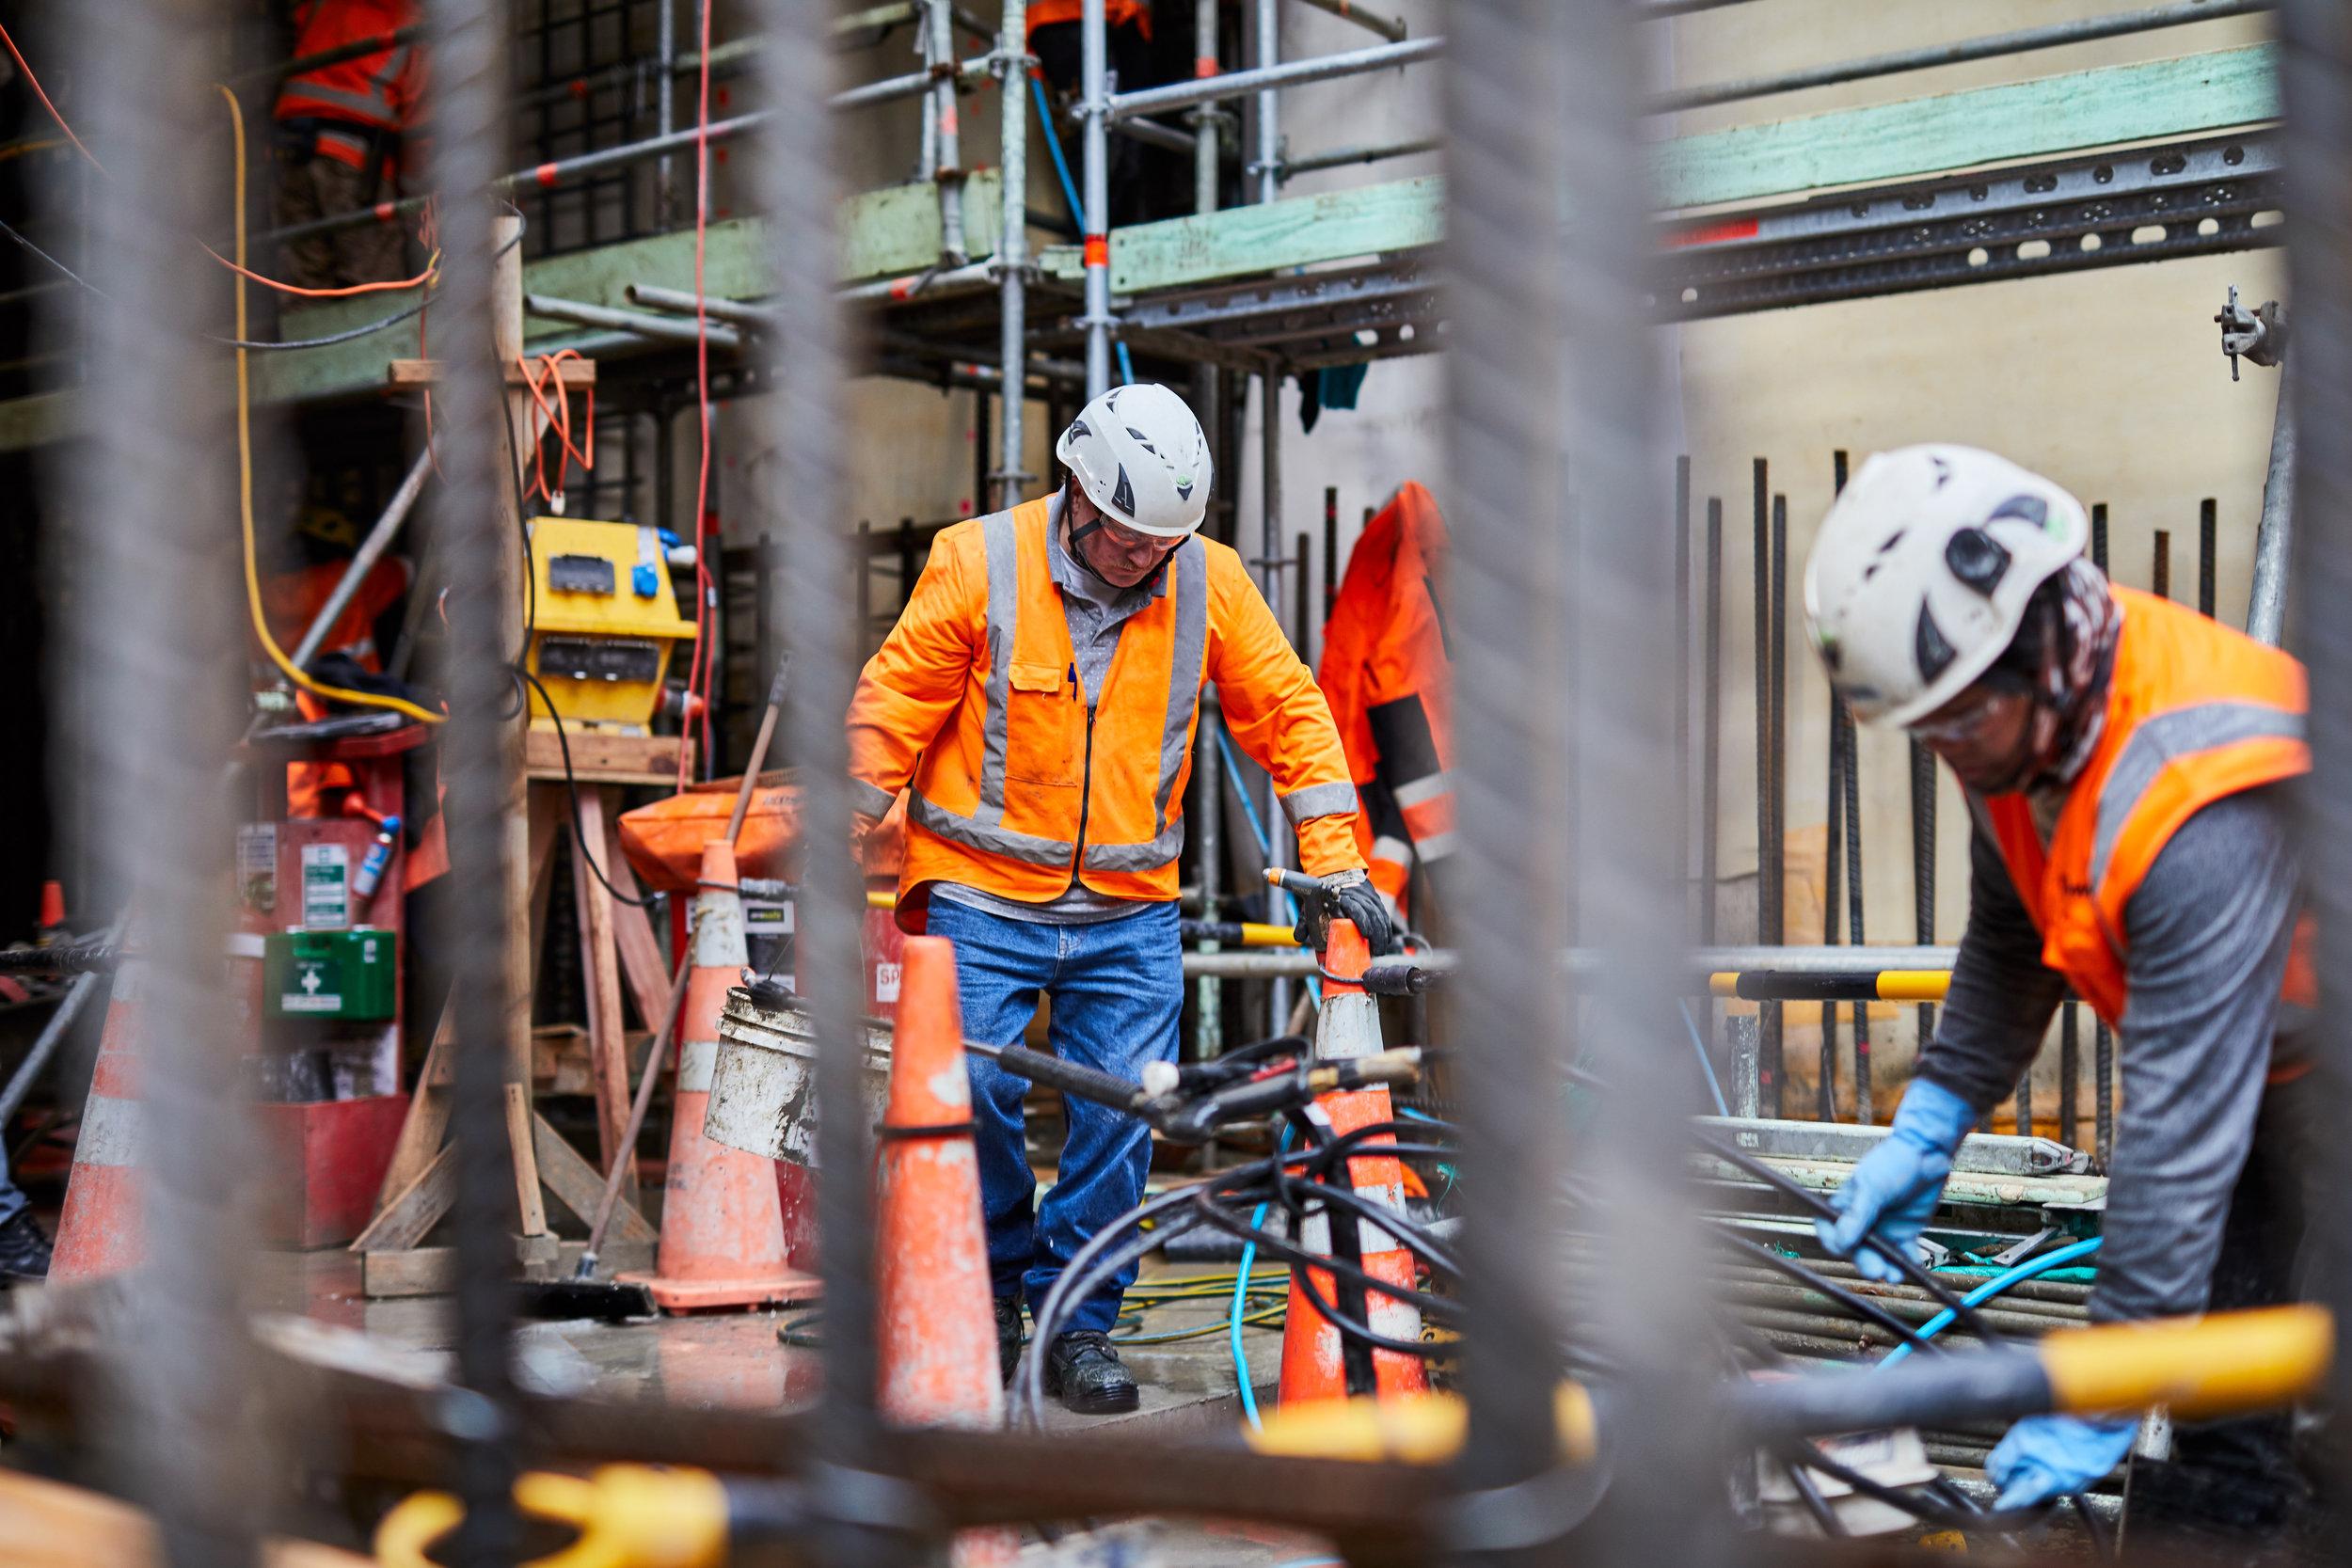 Lower Queen Street tunnel work 26 June 2019